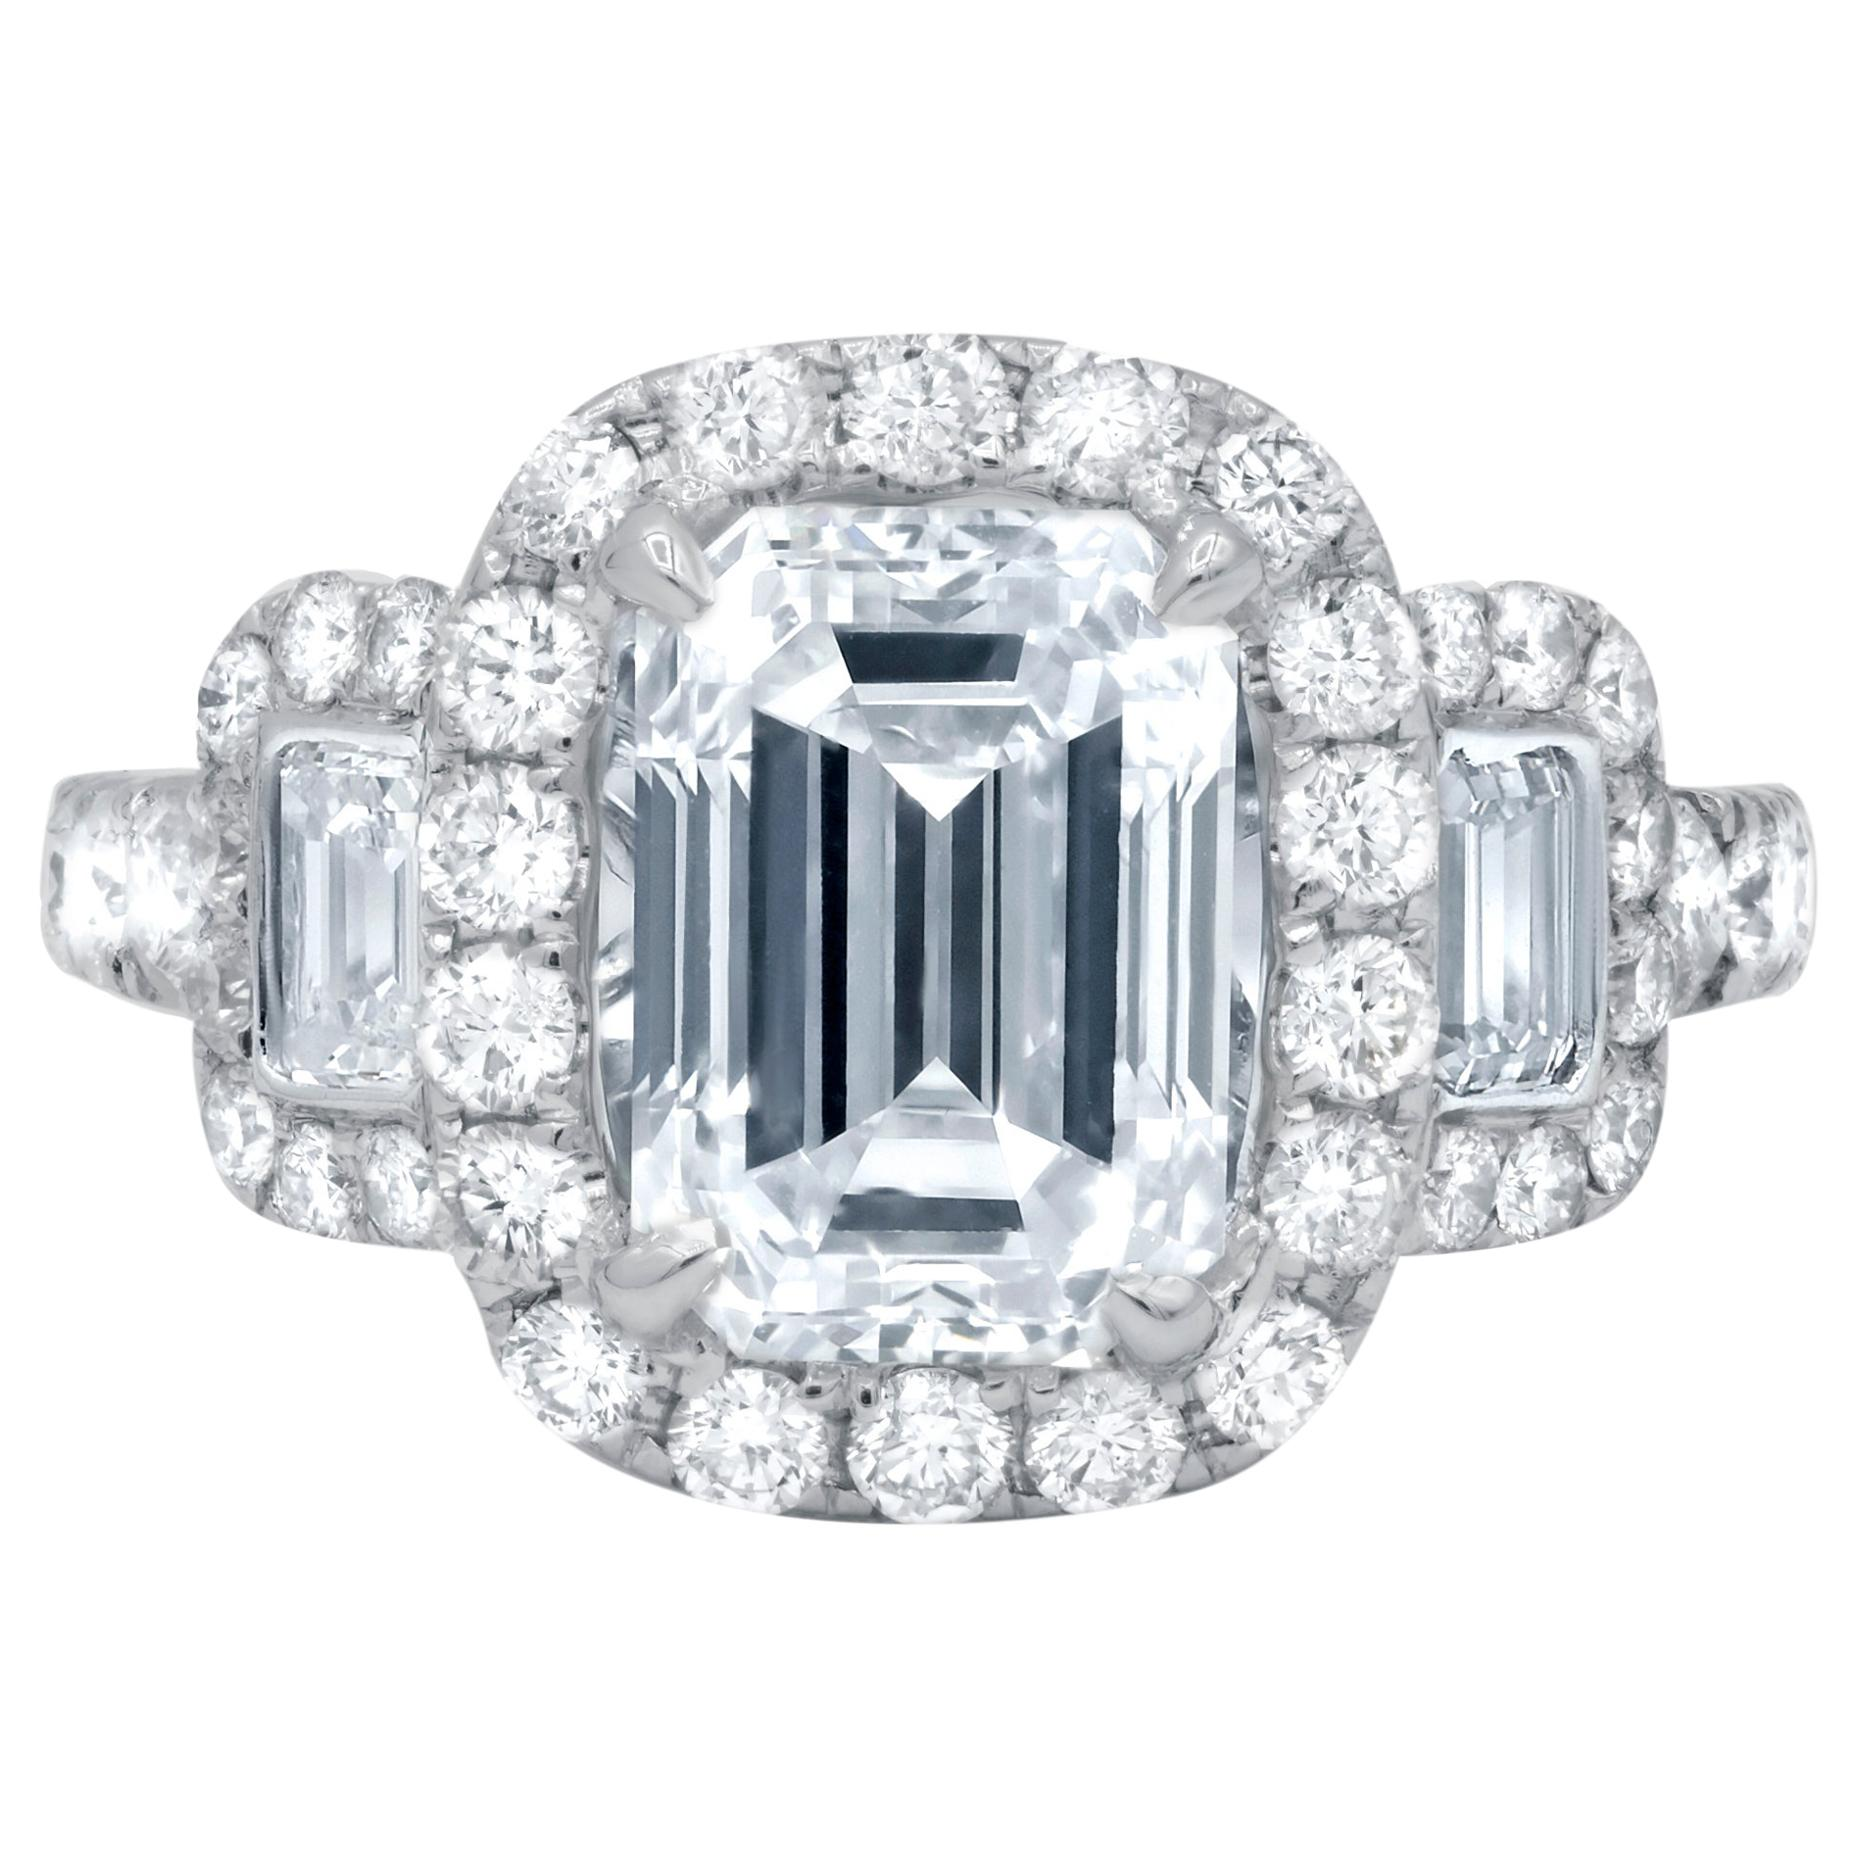 Platinum GIA Three-Stone Diamond Emerald Cut Engagement Ring